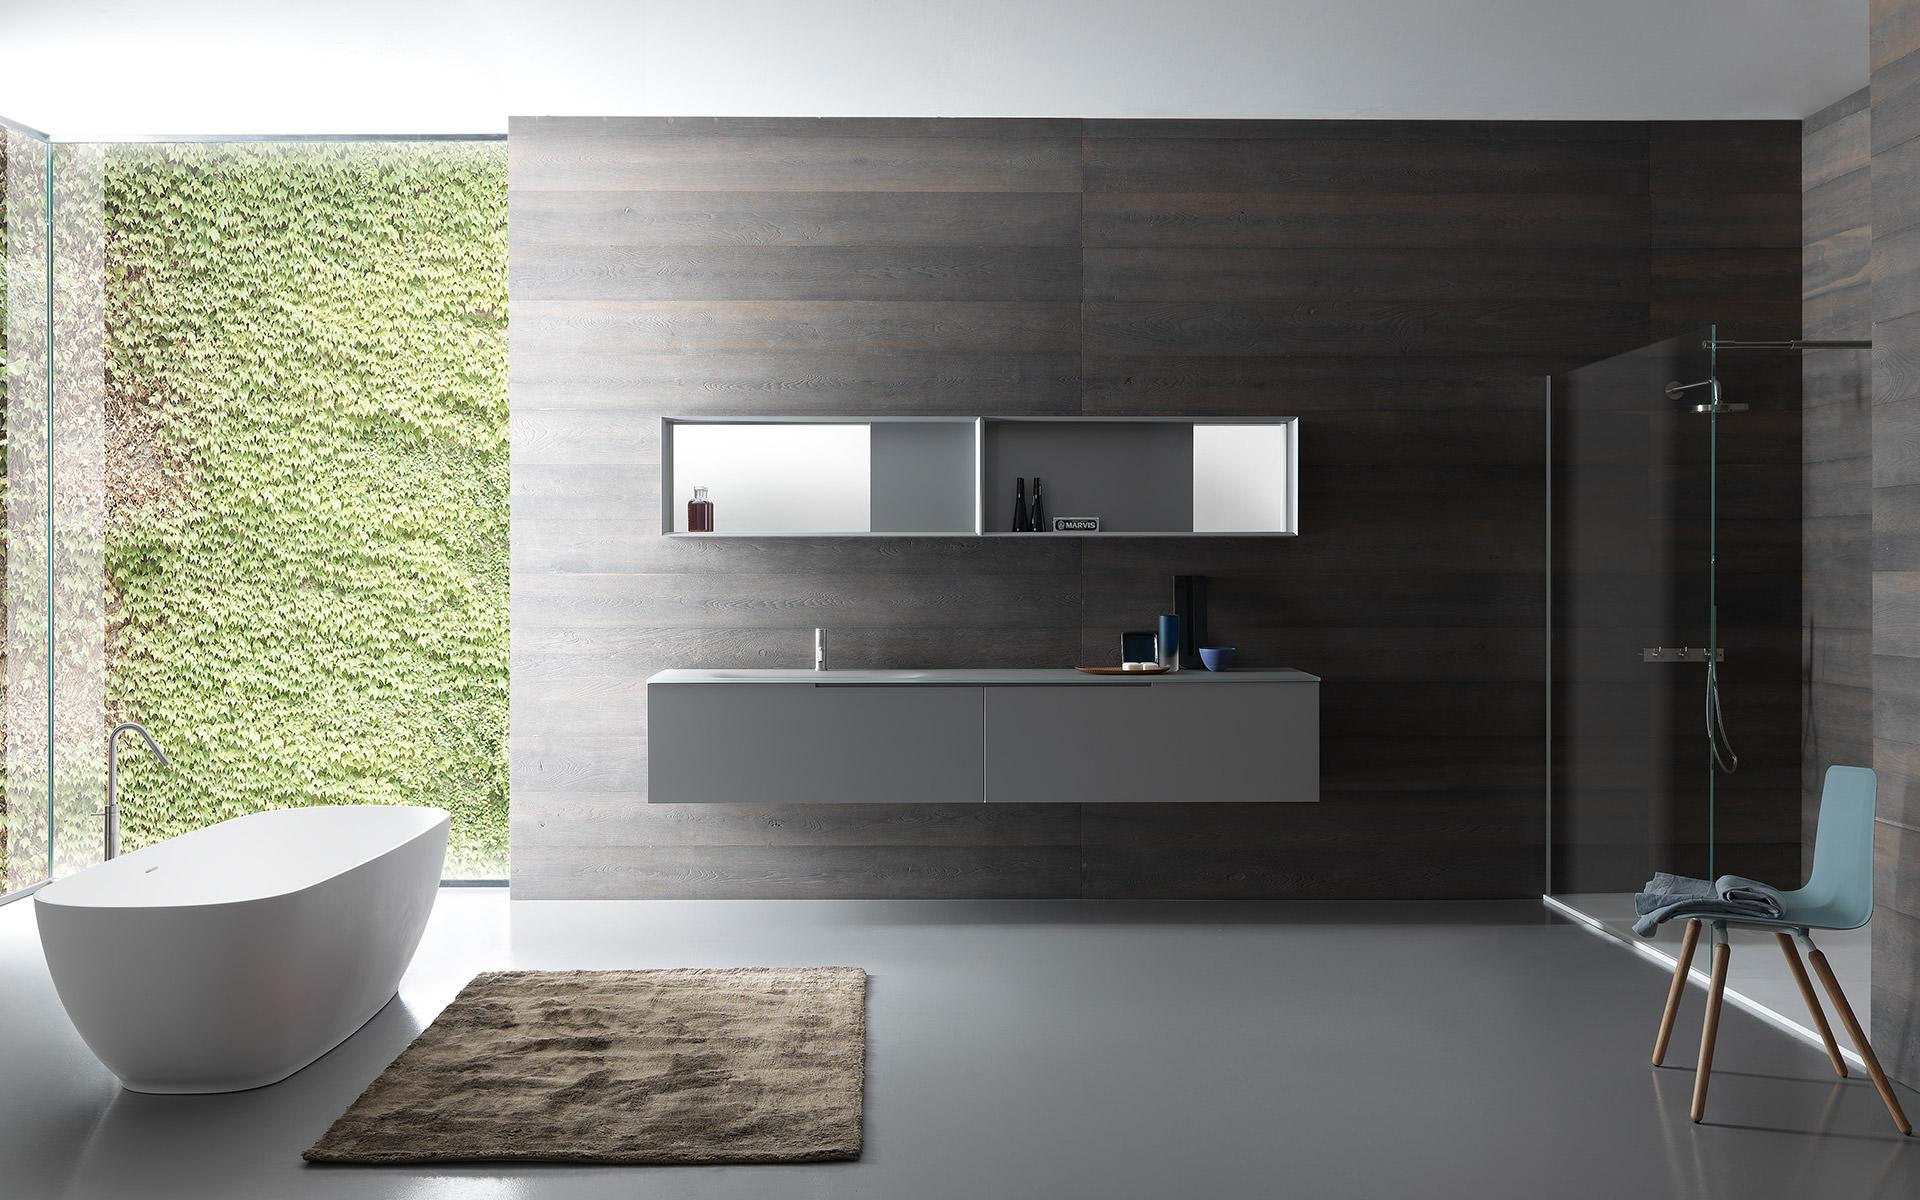 marque salle de bain luxe id e inspirante. Black Bedroom Furniture Sets. Home Design Ideas